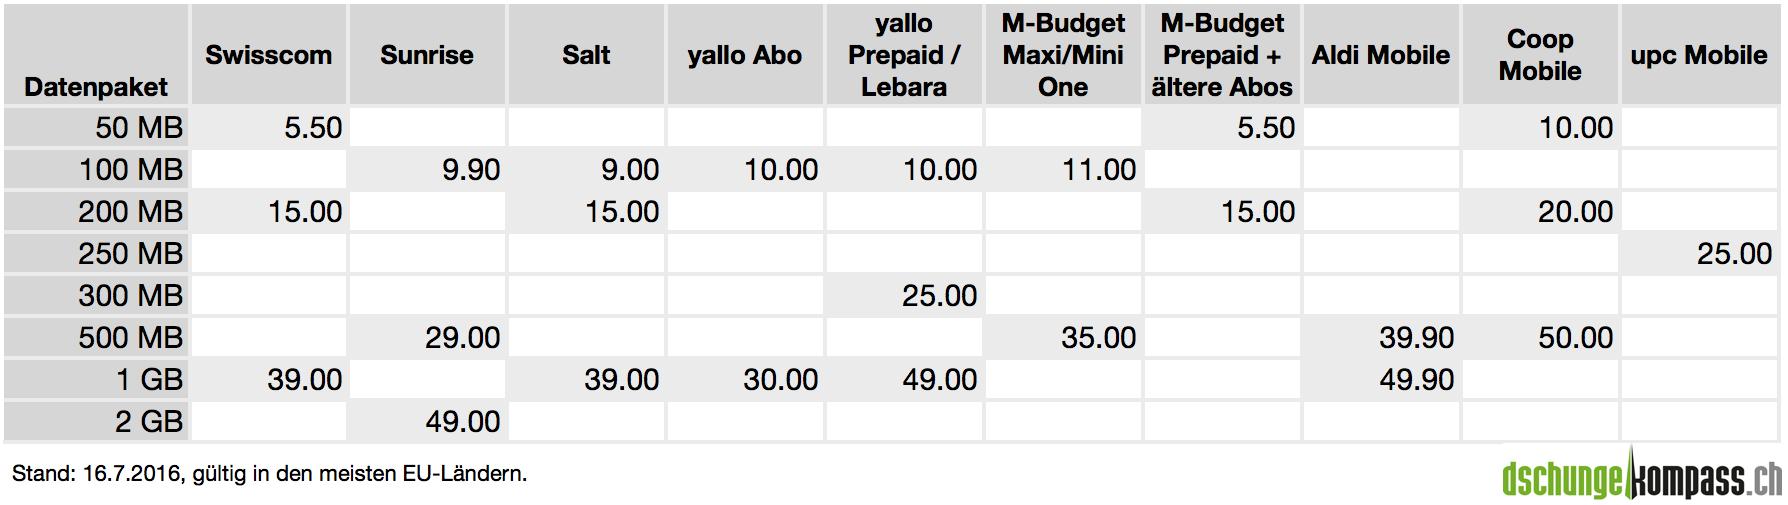 Der handy tarifvergleich f r abos - Afa tabelle gastronomie 2016 ...